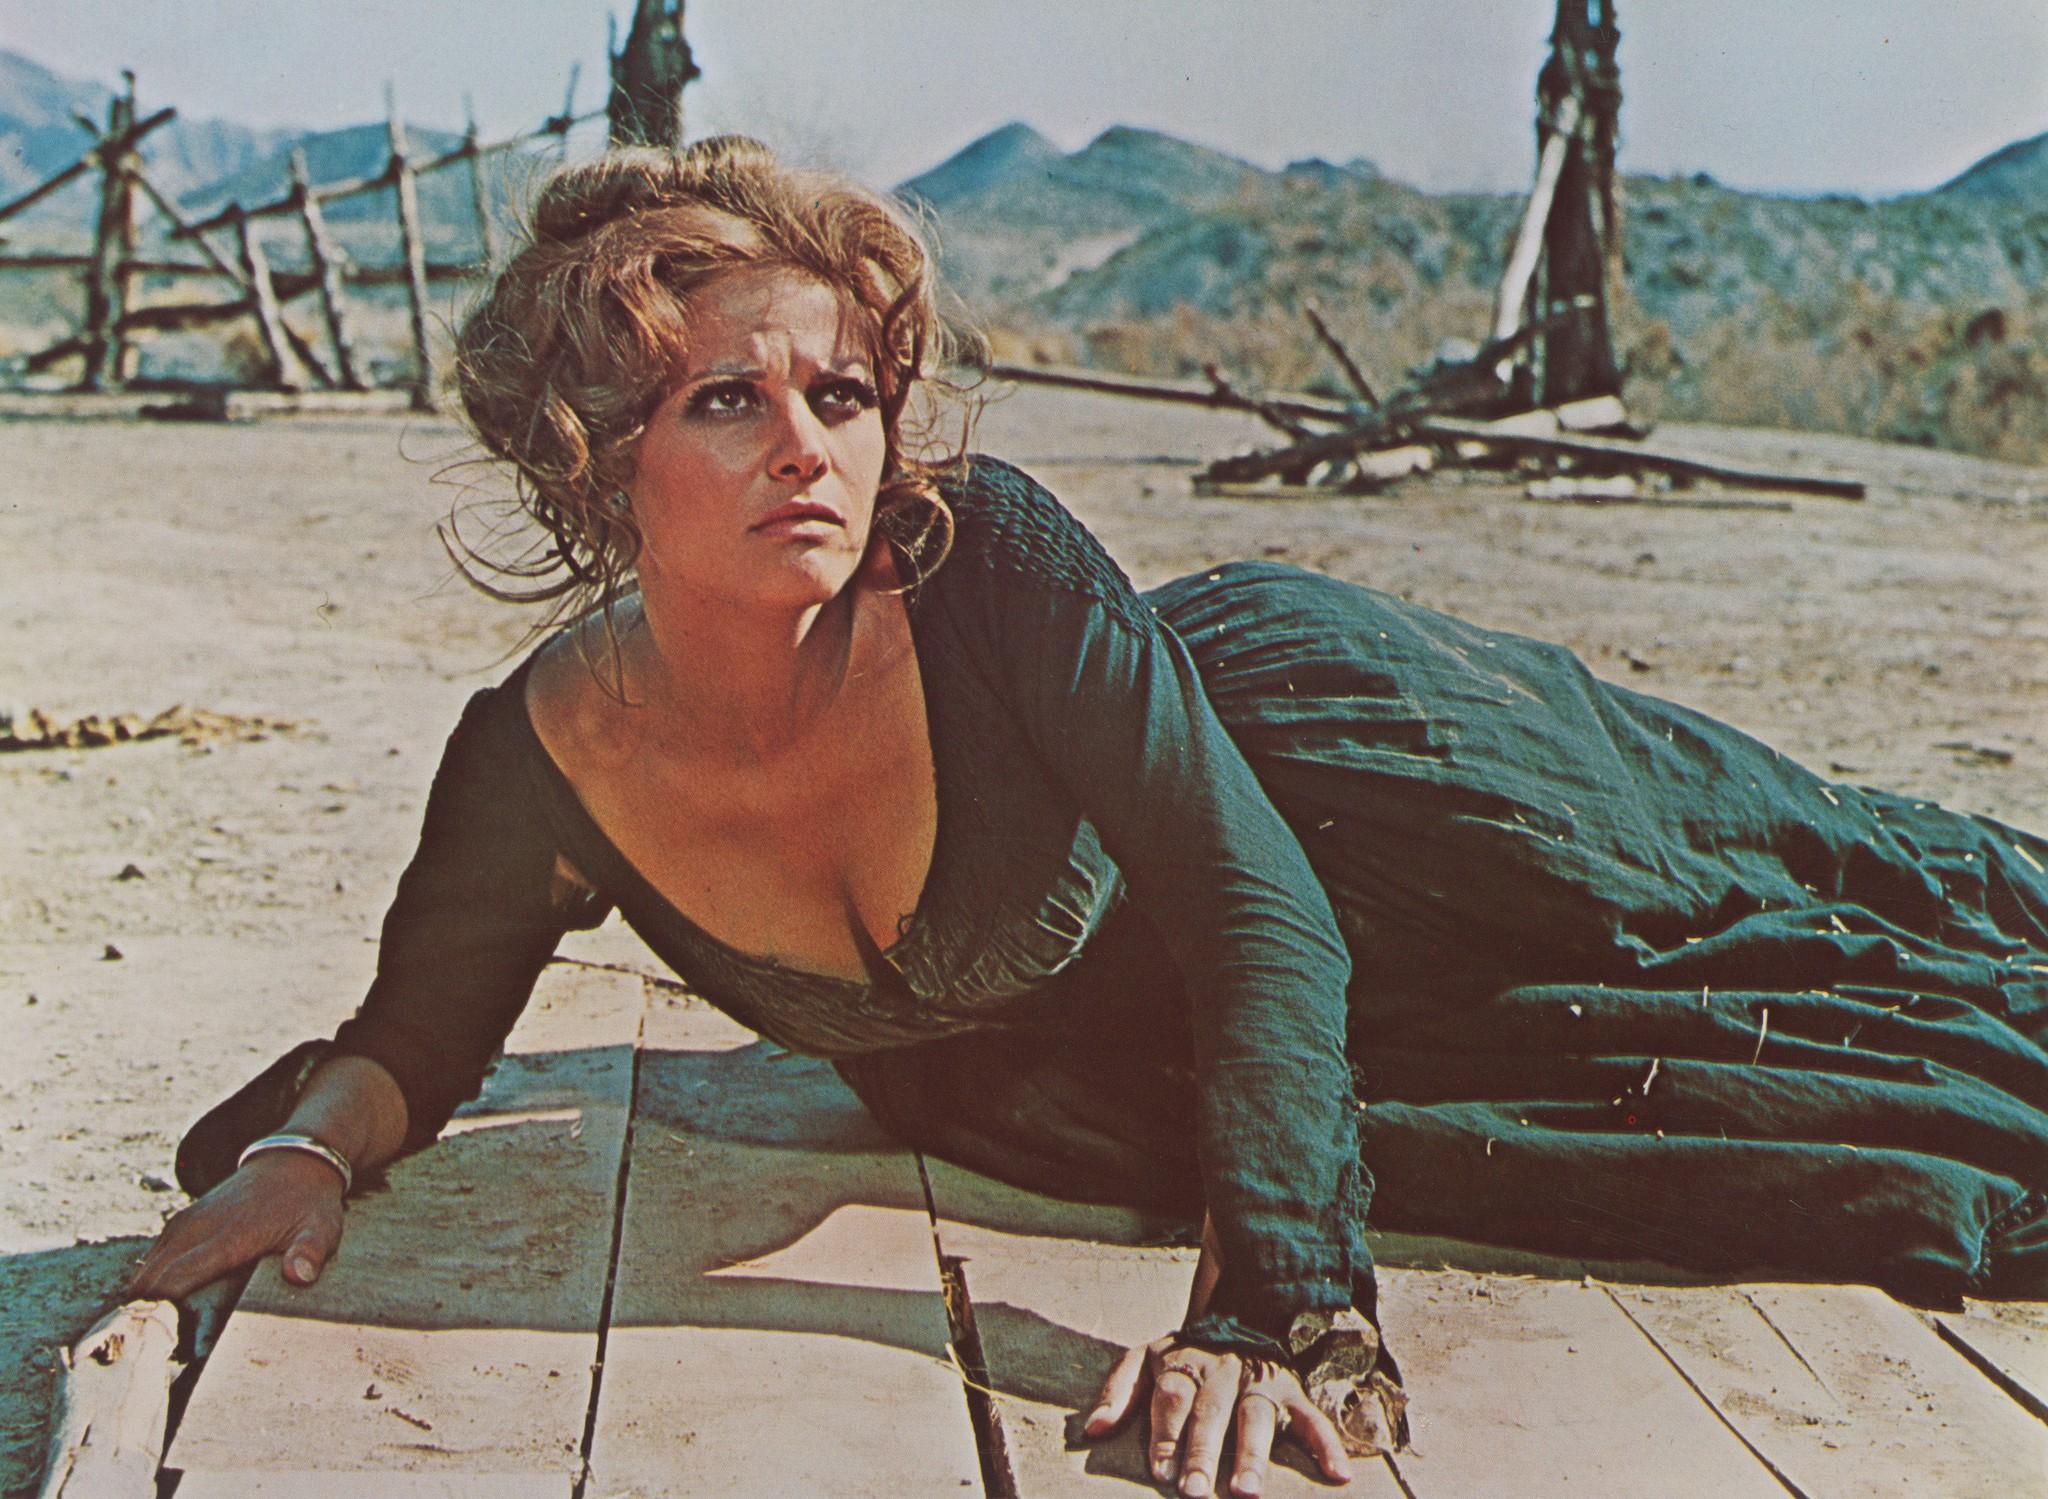 Claudia Cardinale in C'era una volta il West (1968)